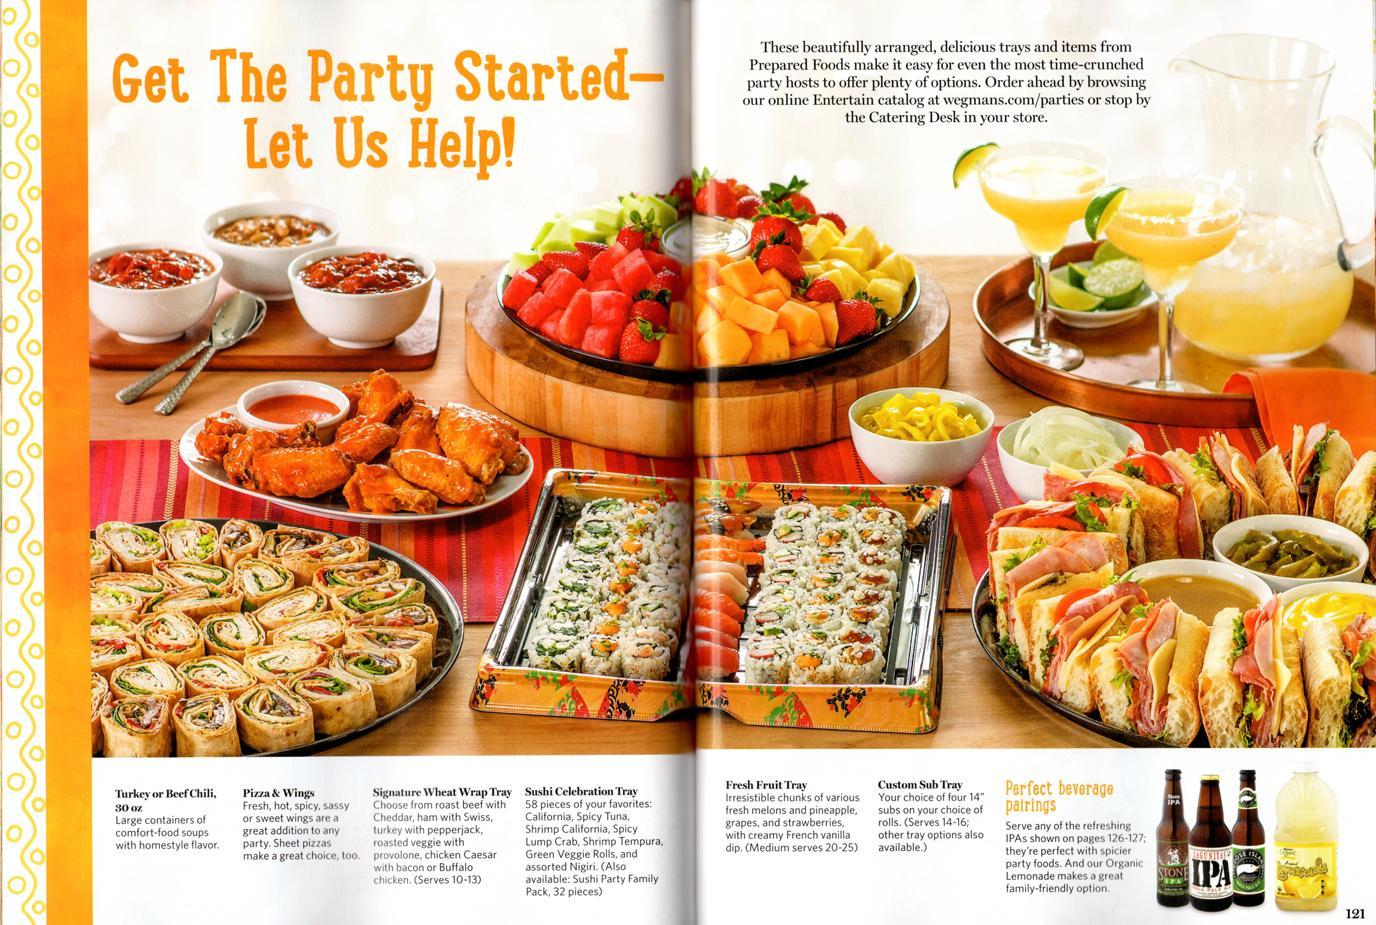 Wegmans menu magazine winter 2015 cuisine cookbook recipes by staff wegmans menu magazine winter 2015 cuisine cookbook recipes uncredited staff forumfinder Choice Image